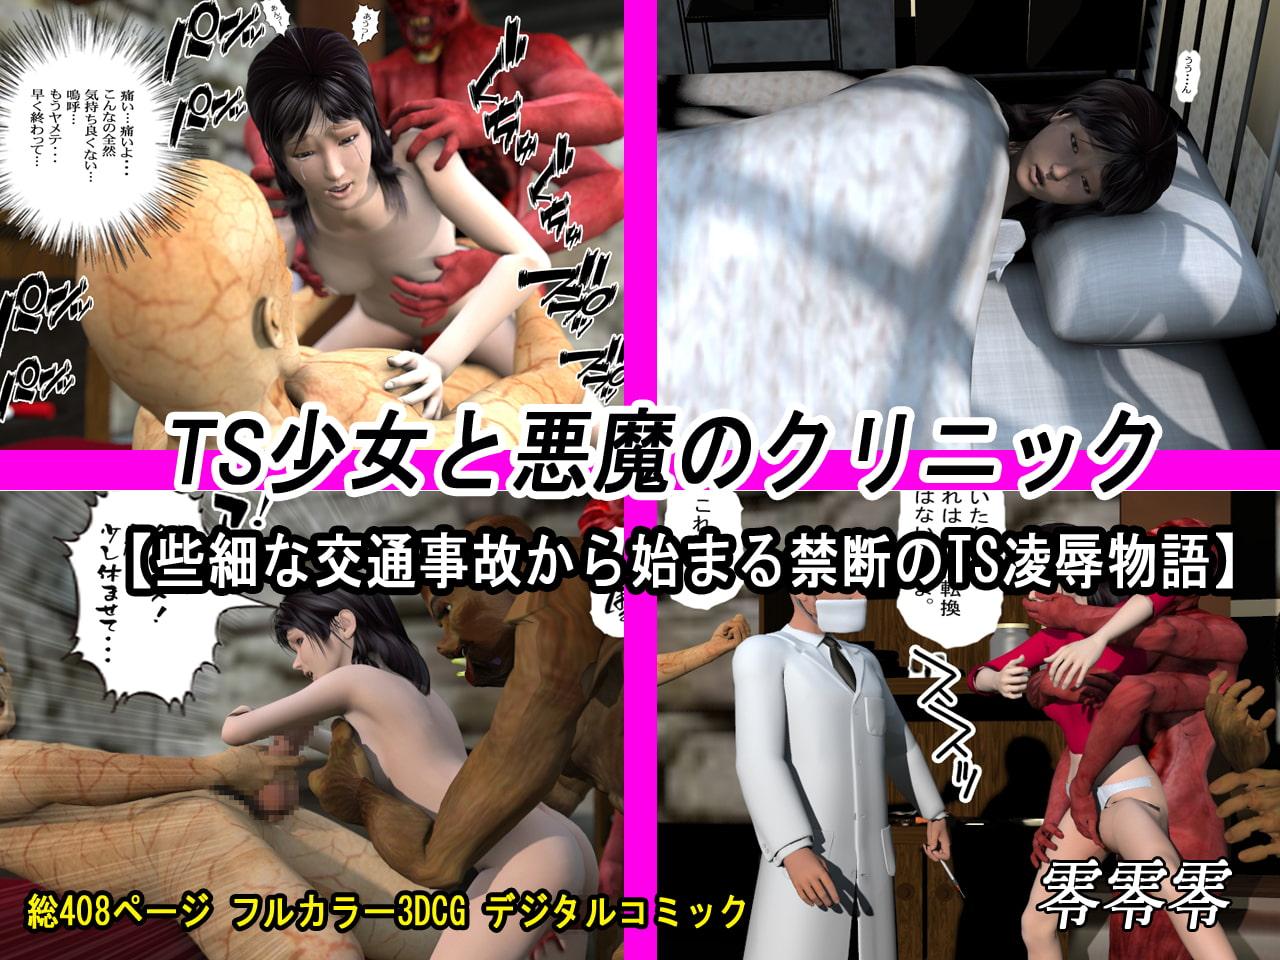 TS少女と悪魔のクリニック (些細な交通事故から始まる禁断のTS凌辱物語)のサンプル画像7